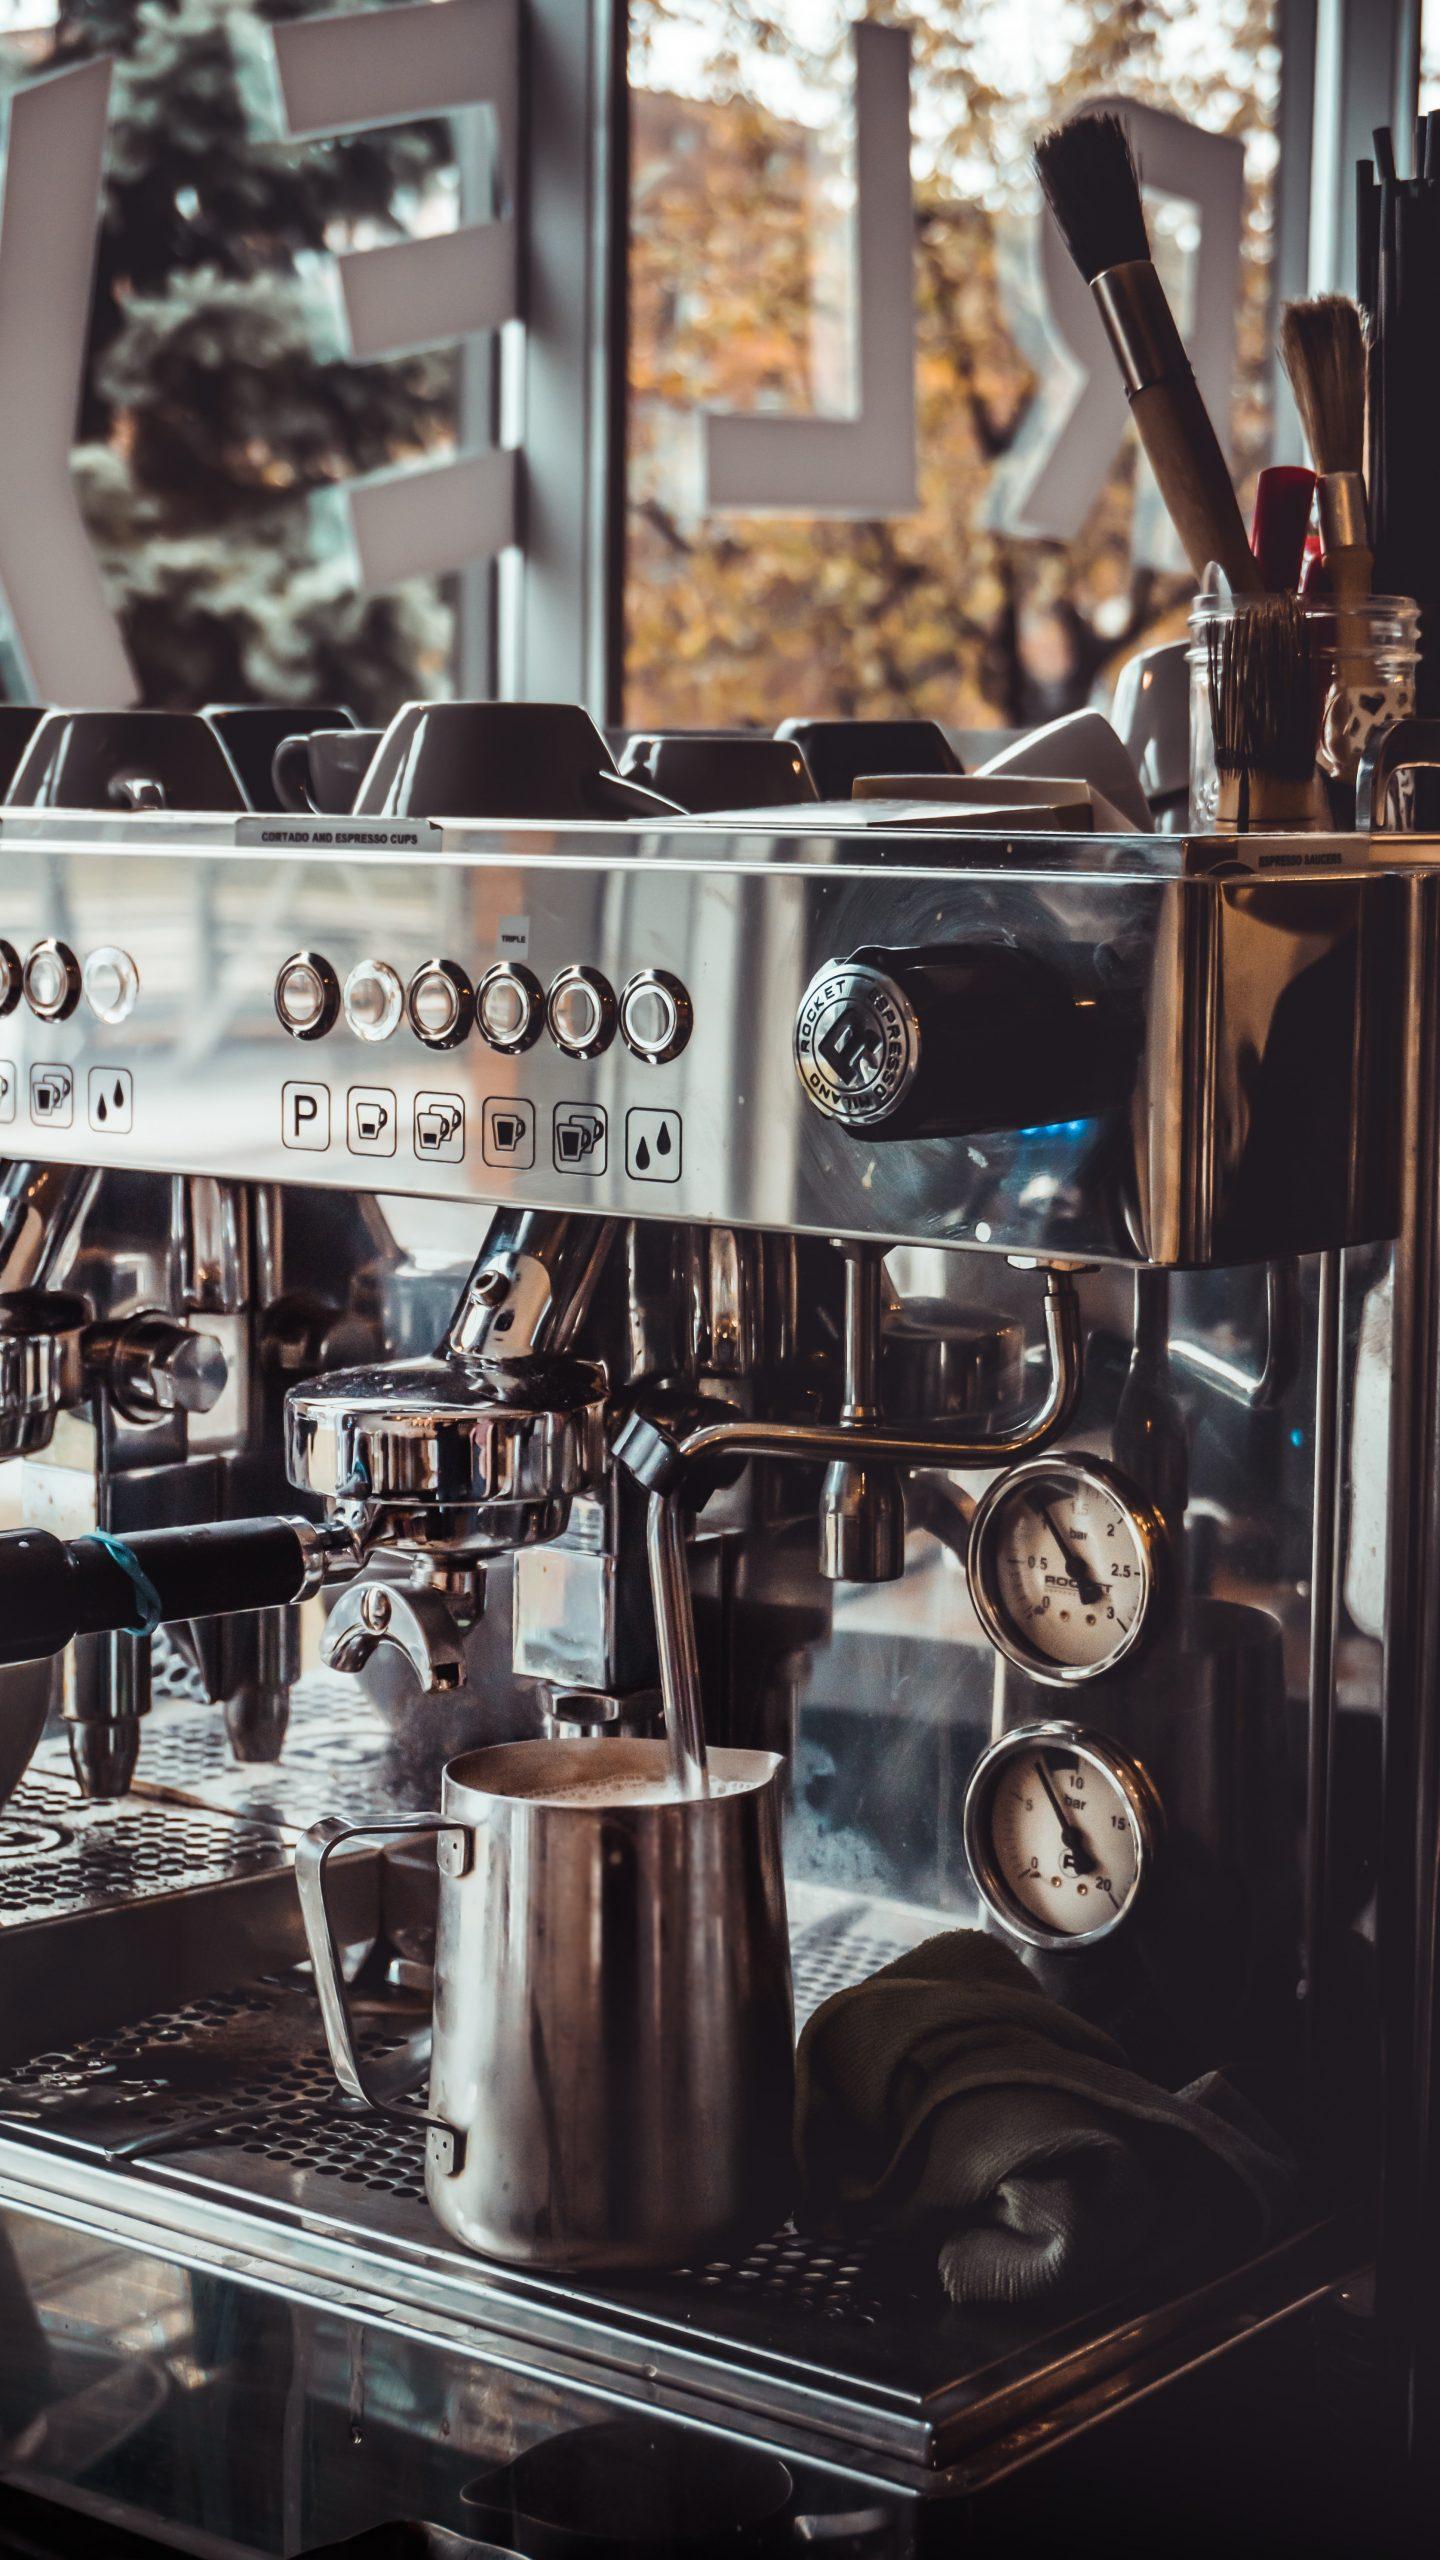 Kontamination im Kaffeehaus